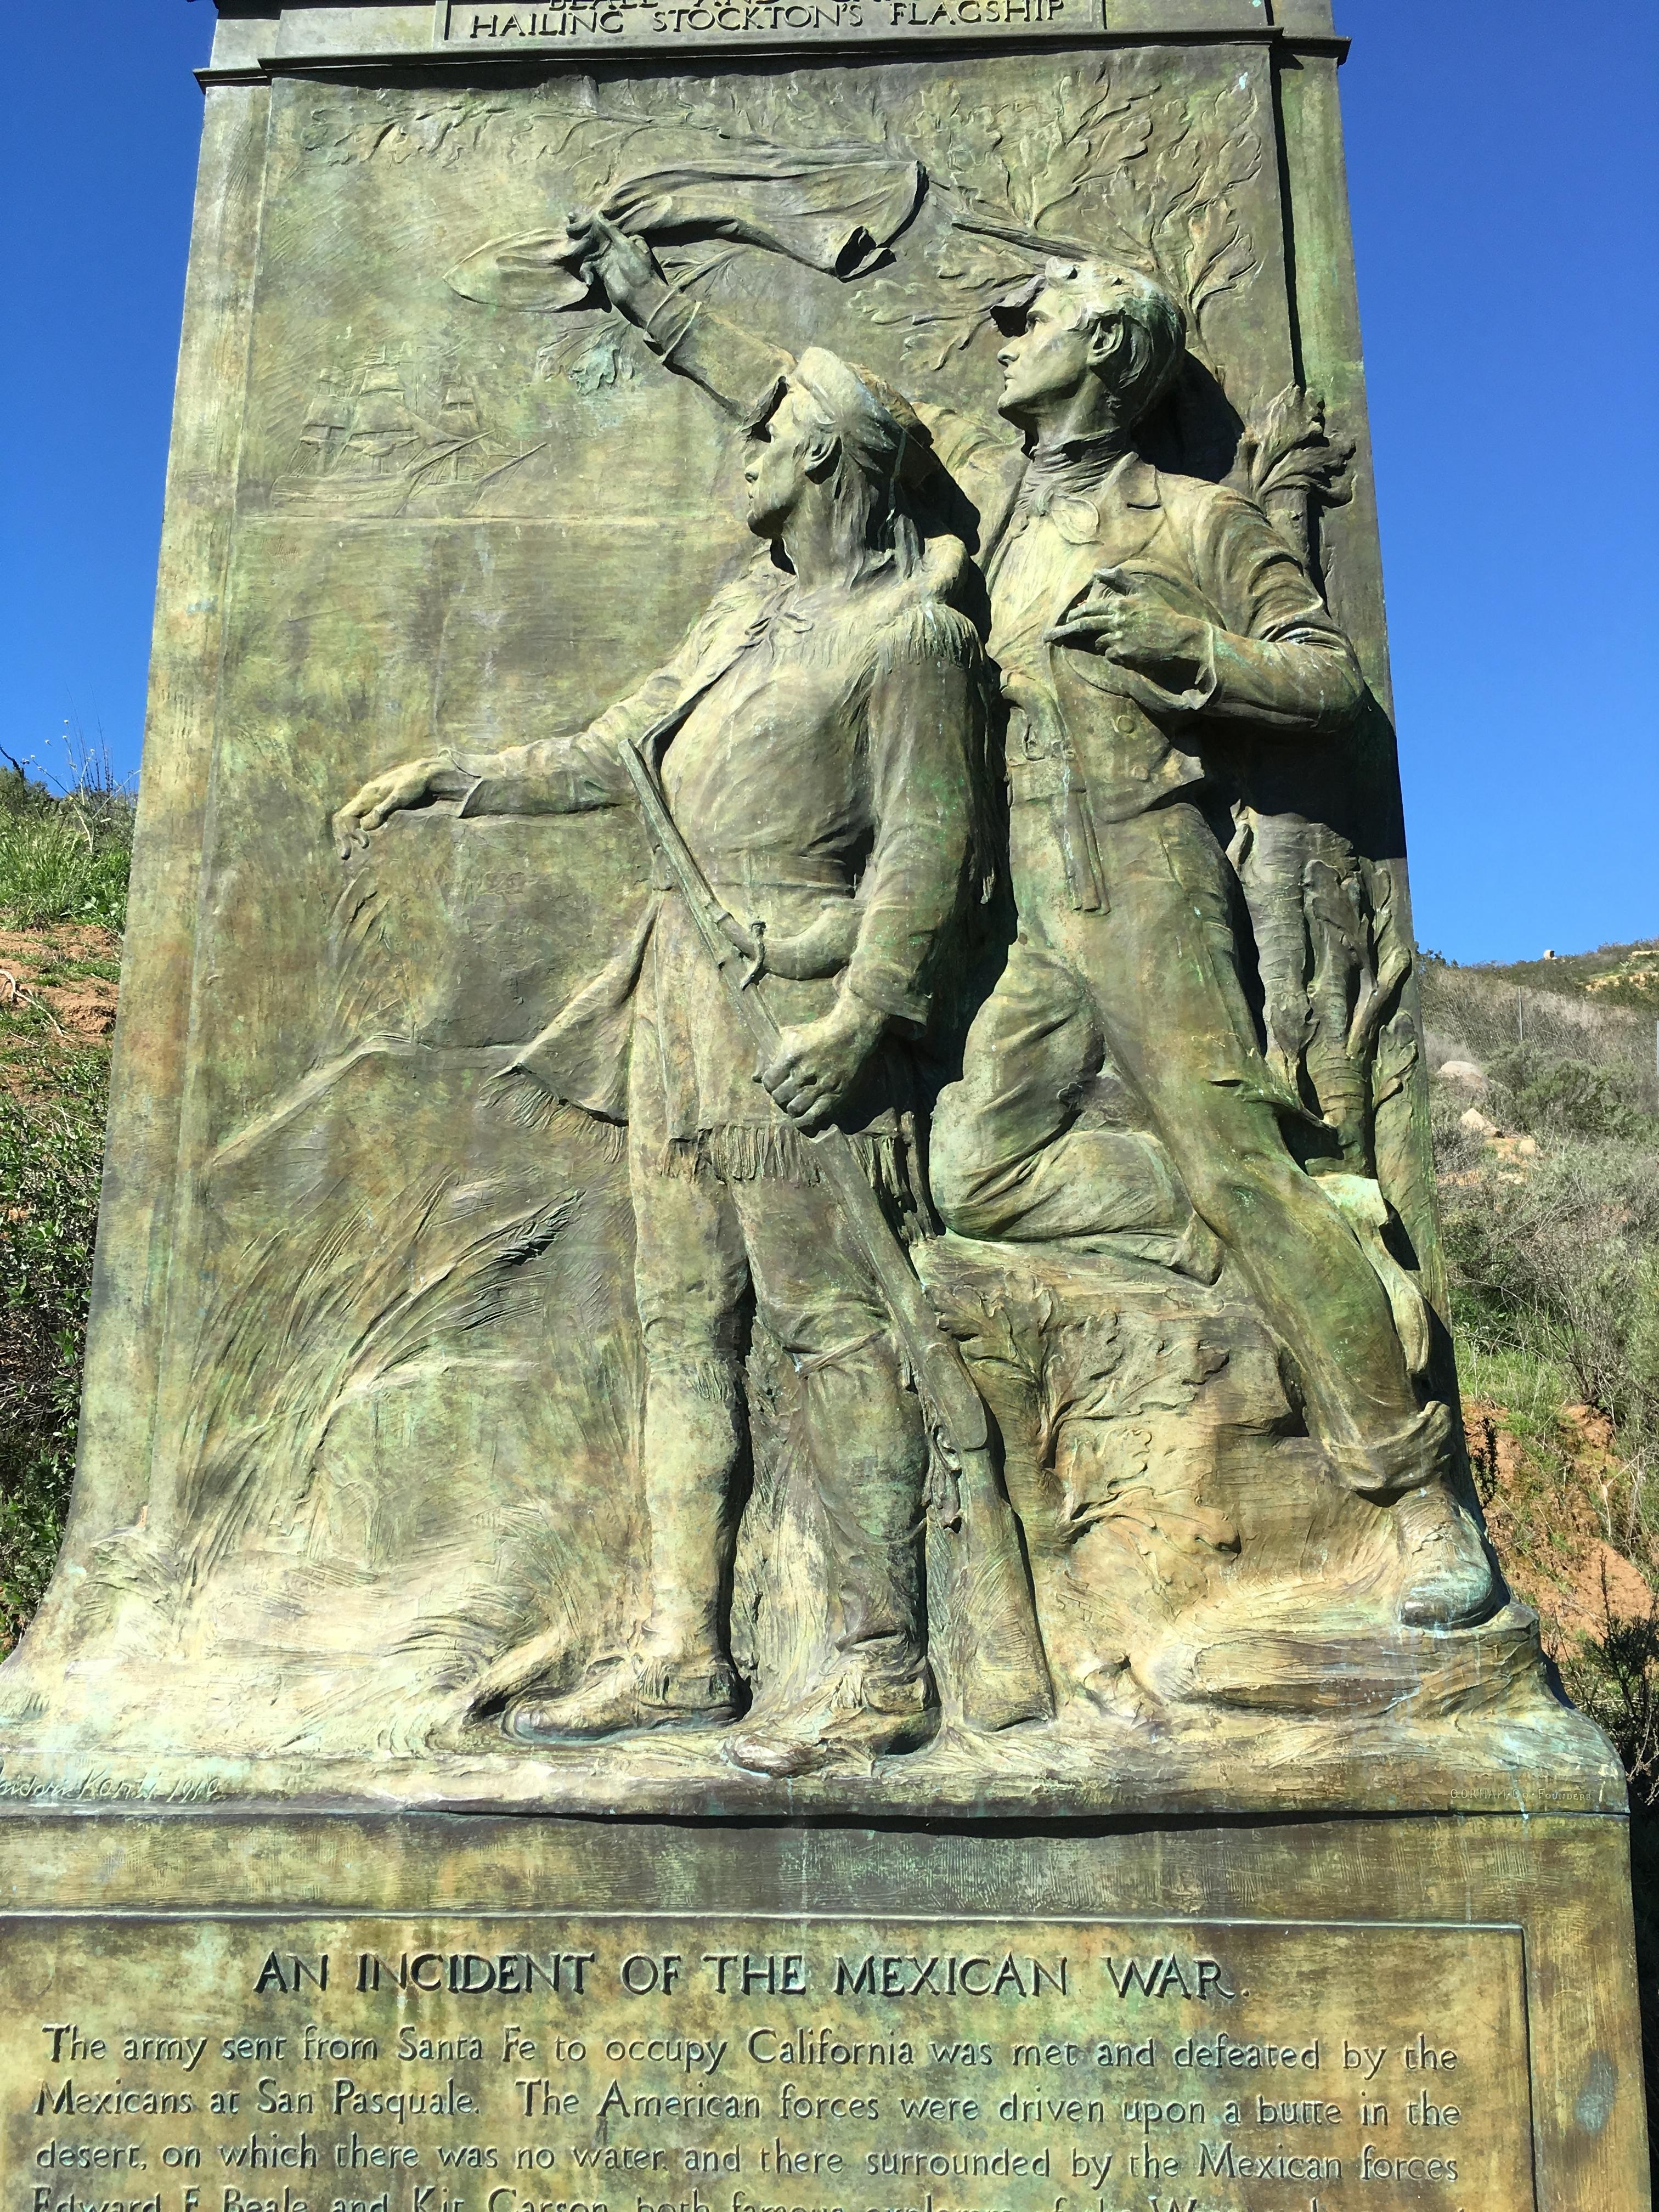 San Pasqual Battlefield Museum